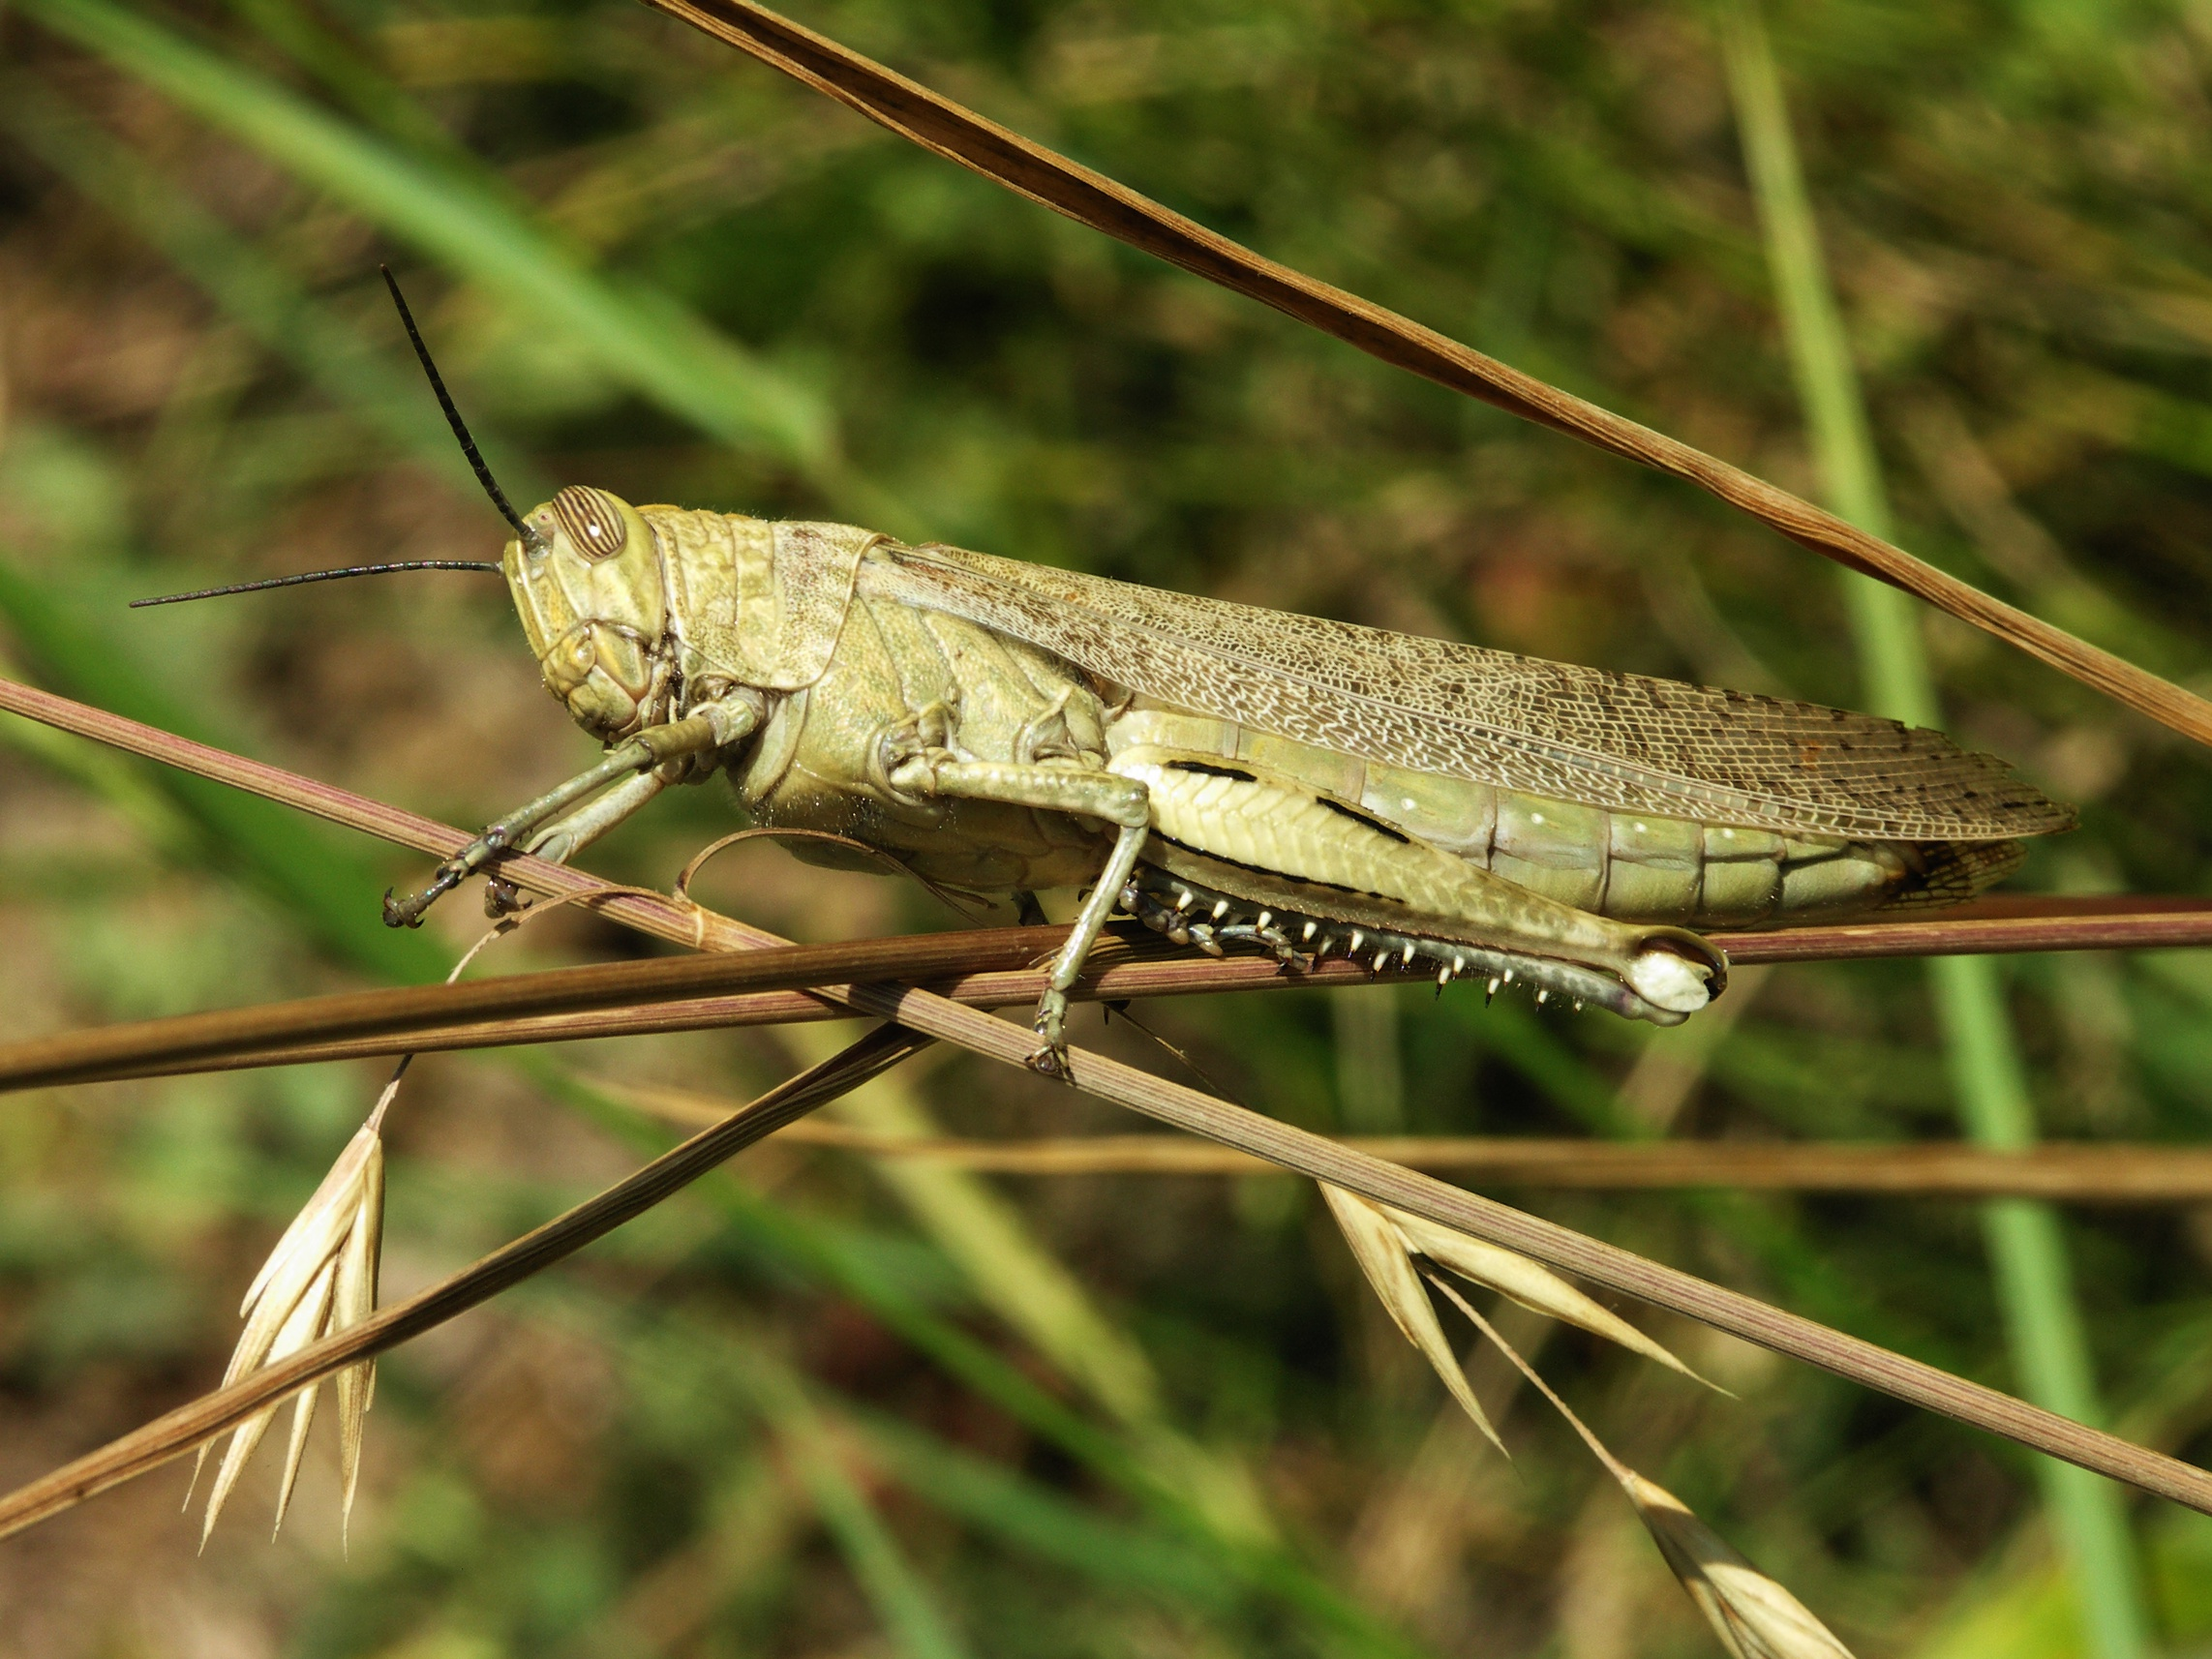 Acrididae_grasshopper-2.jpg